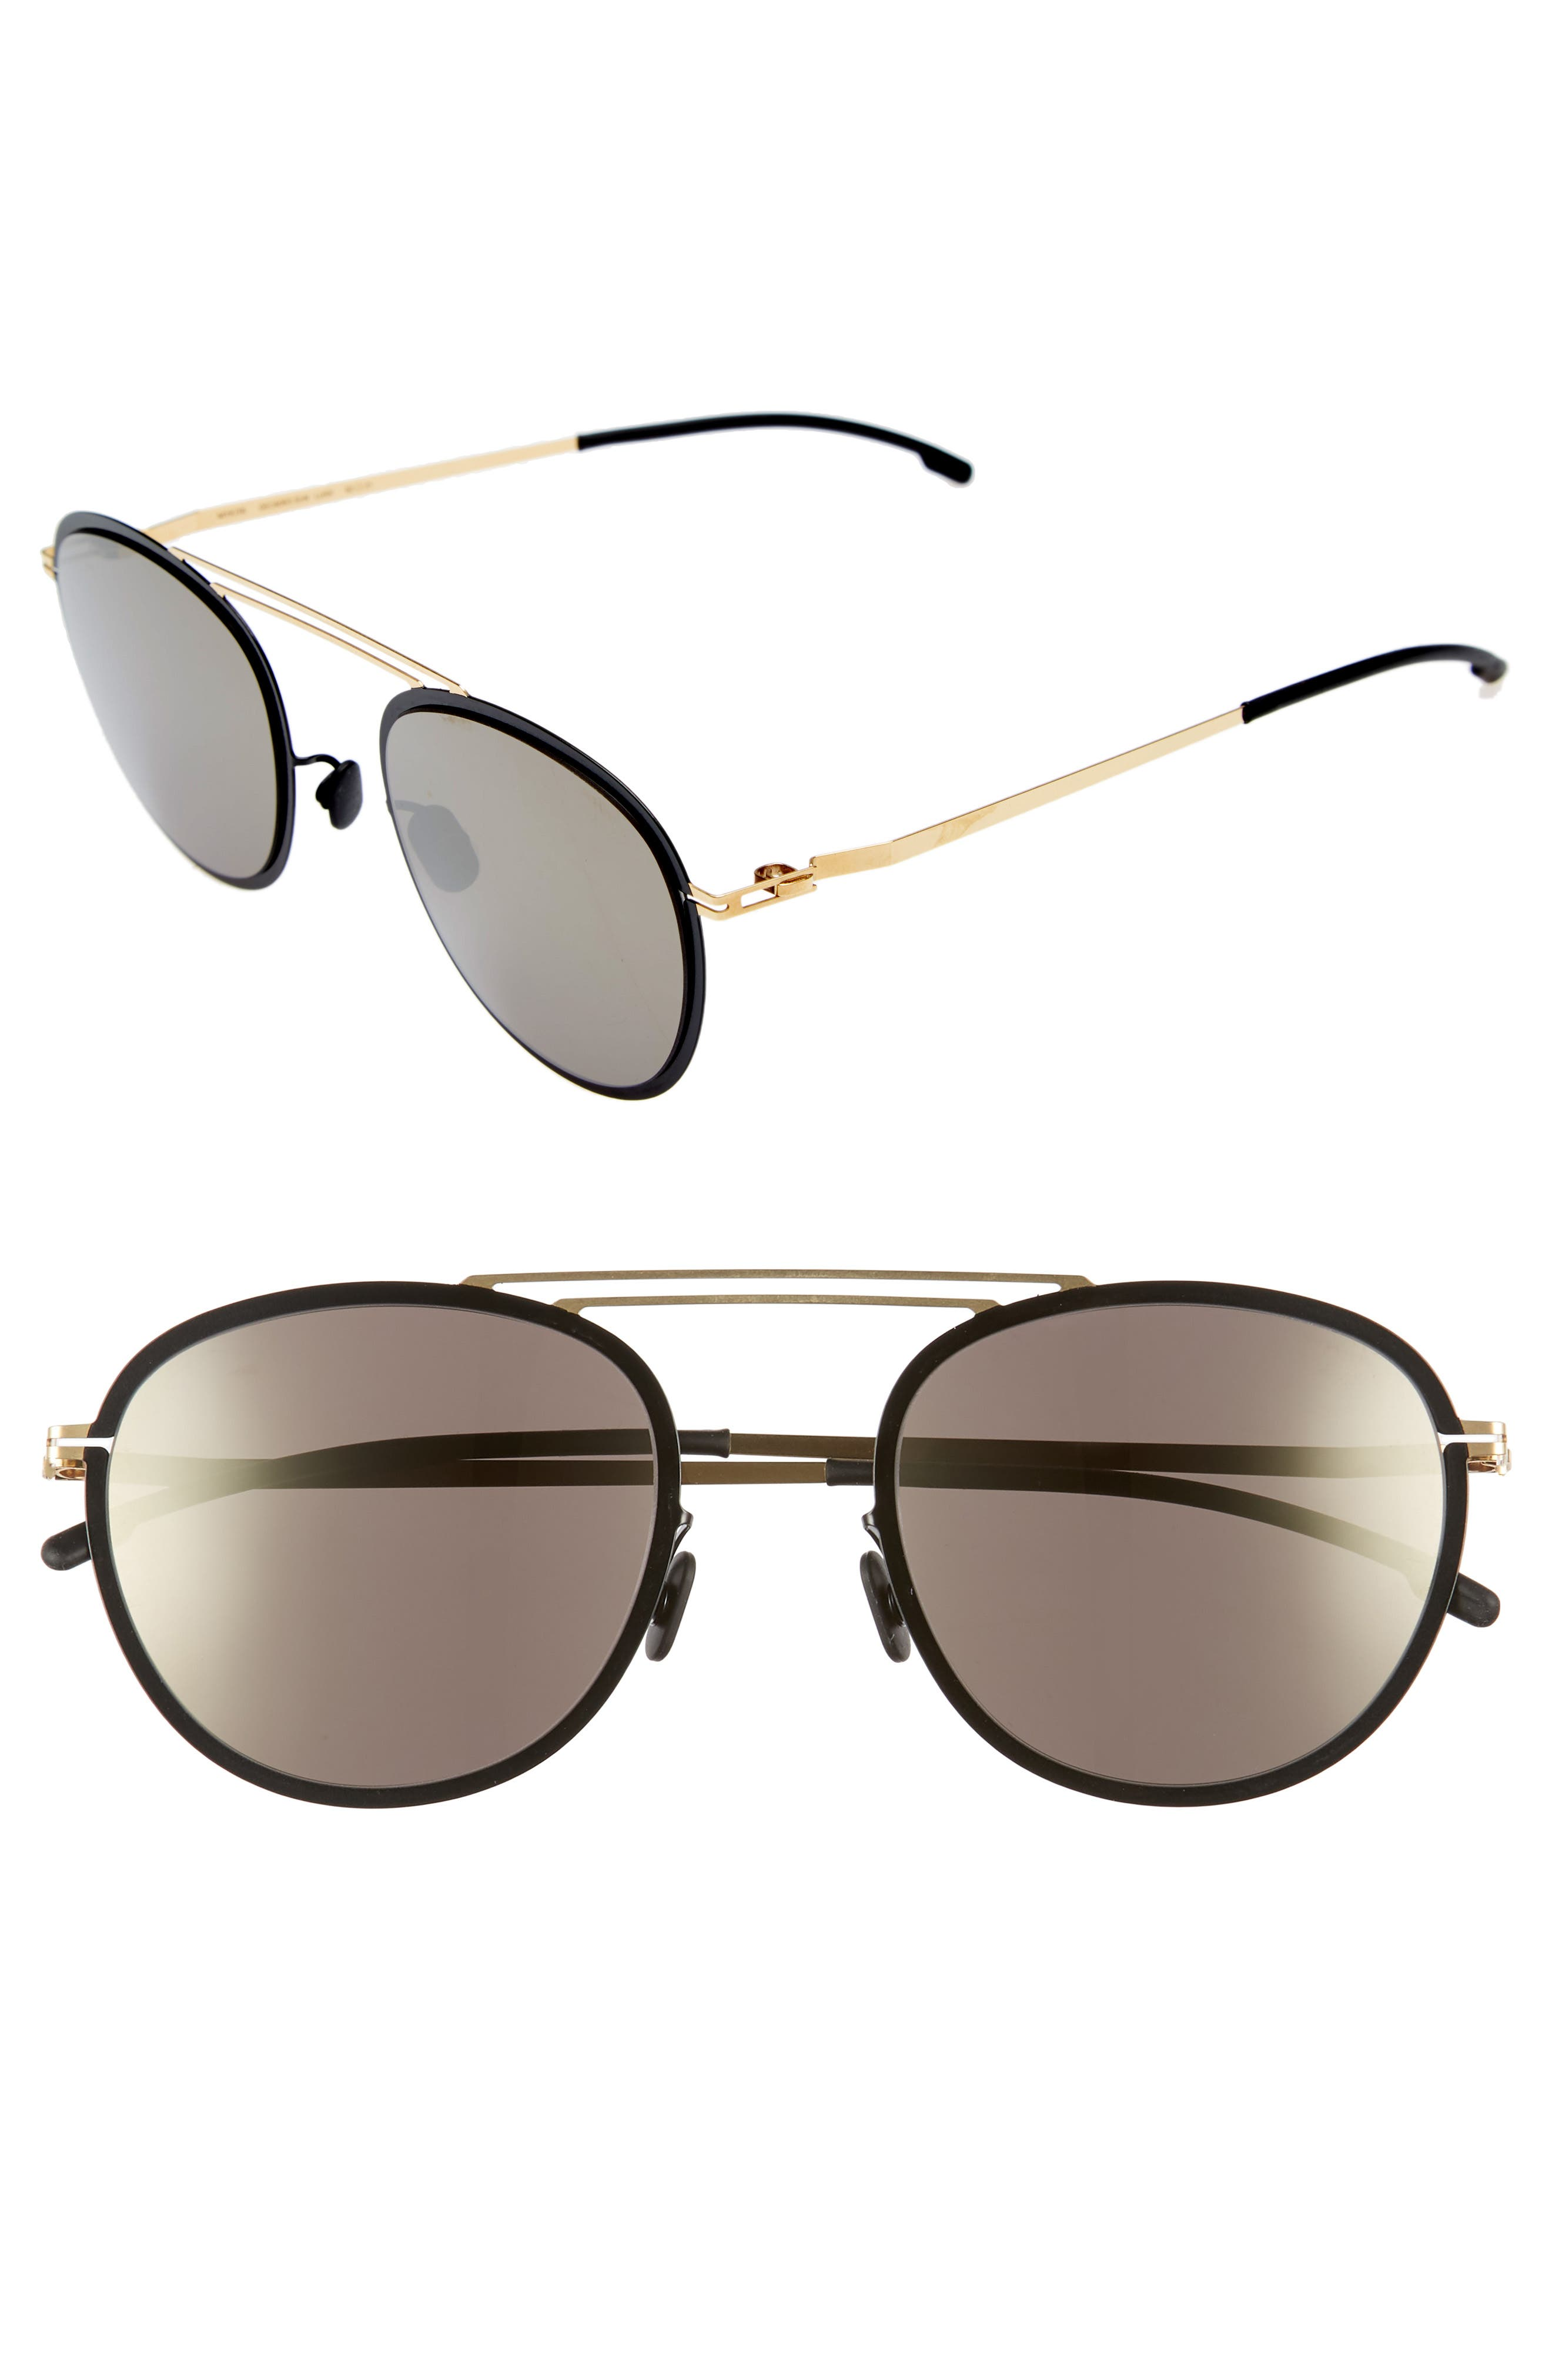 Luigi 52mm Aviator Sunglasses,                             Main thumbnail 1, color,                             710